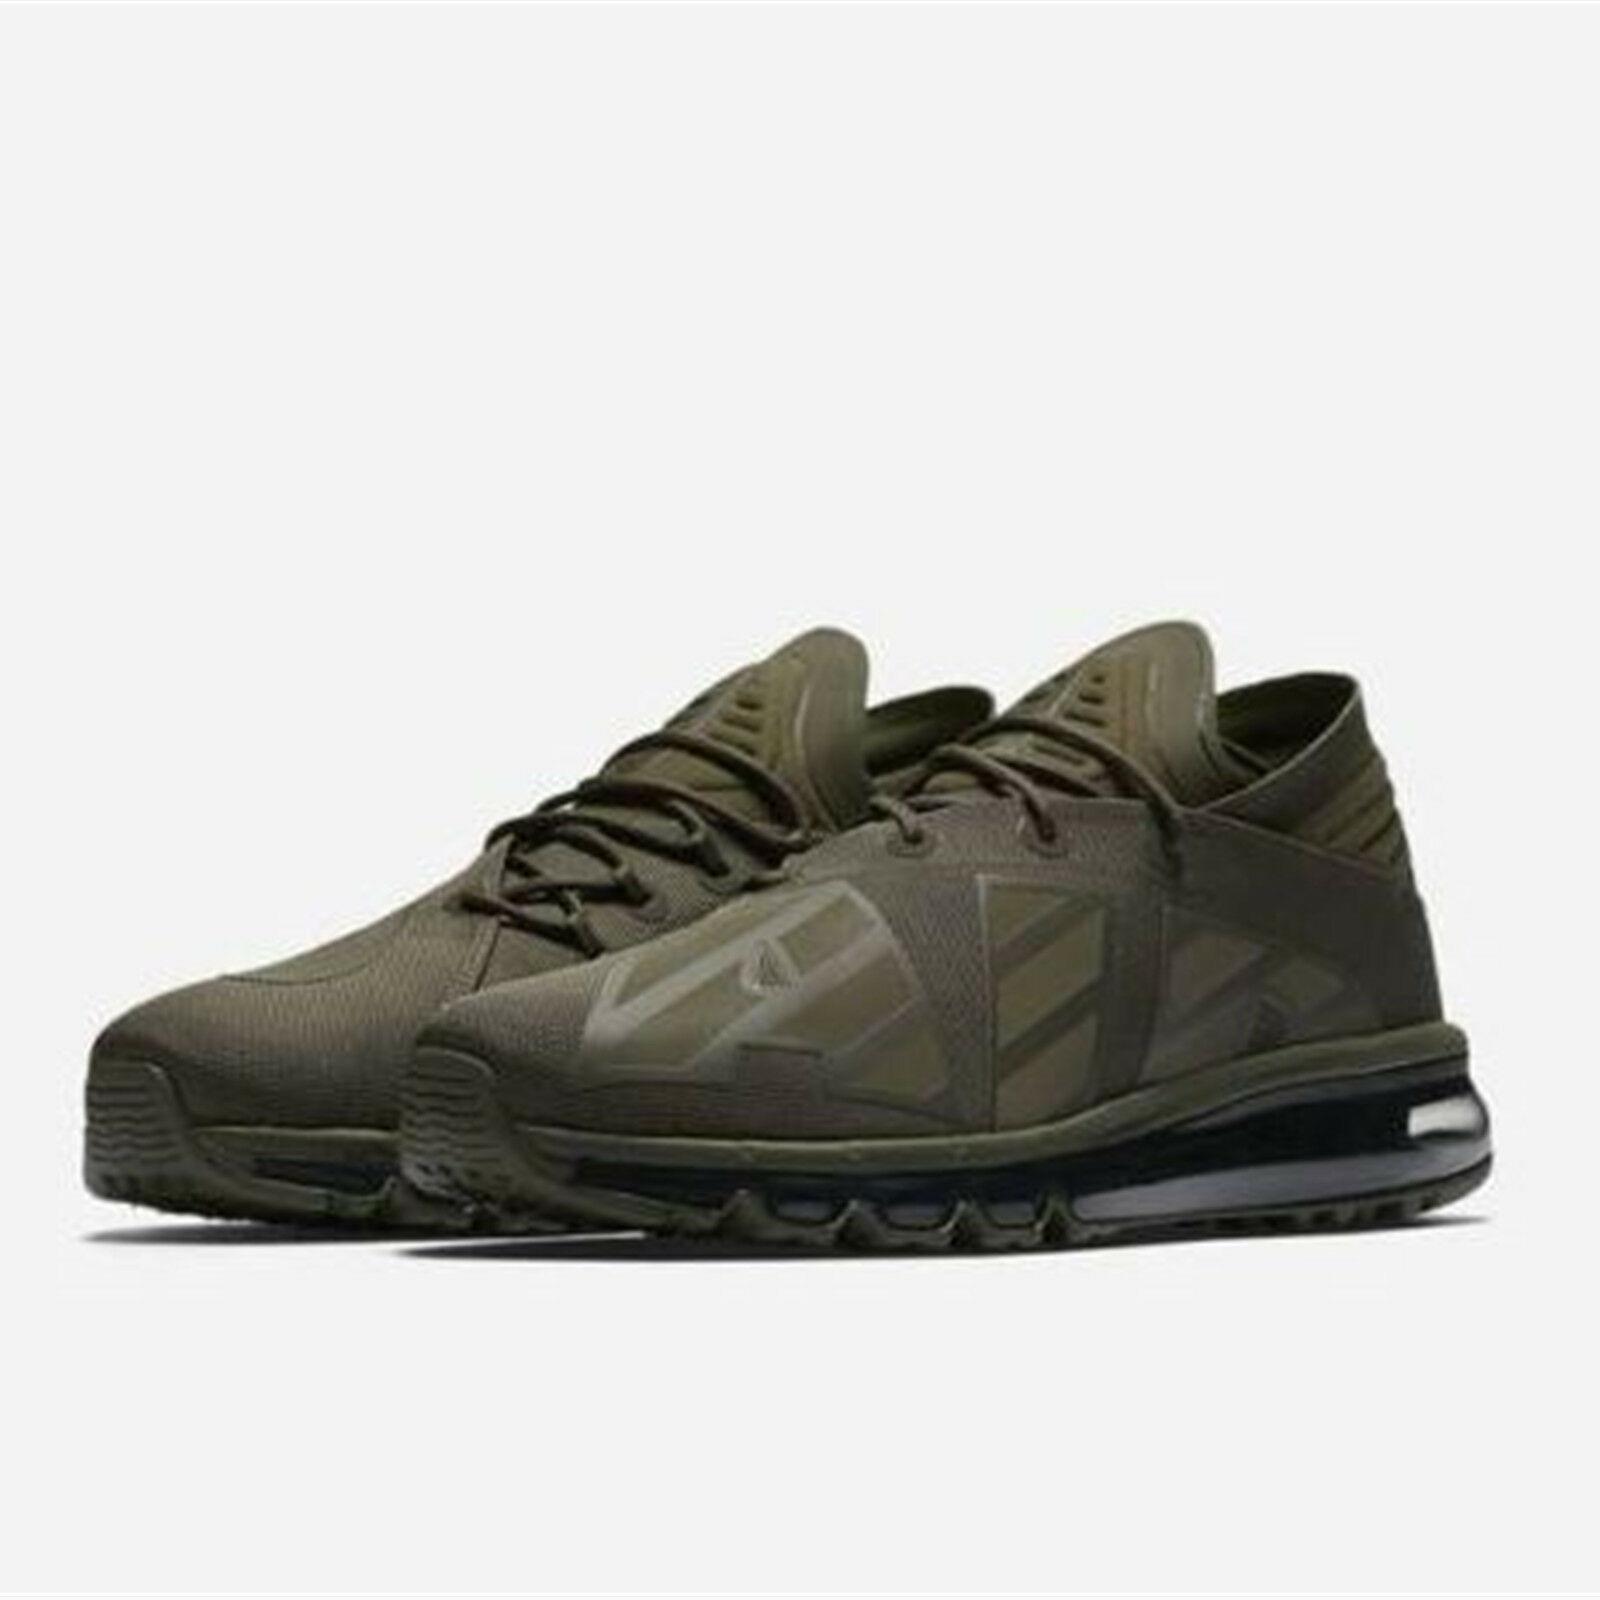 NIKE AIR MAX FLAIR SE ,CARGO KHAKI,Men's Running Shoes.New in Box.